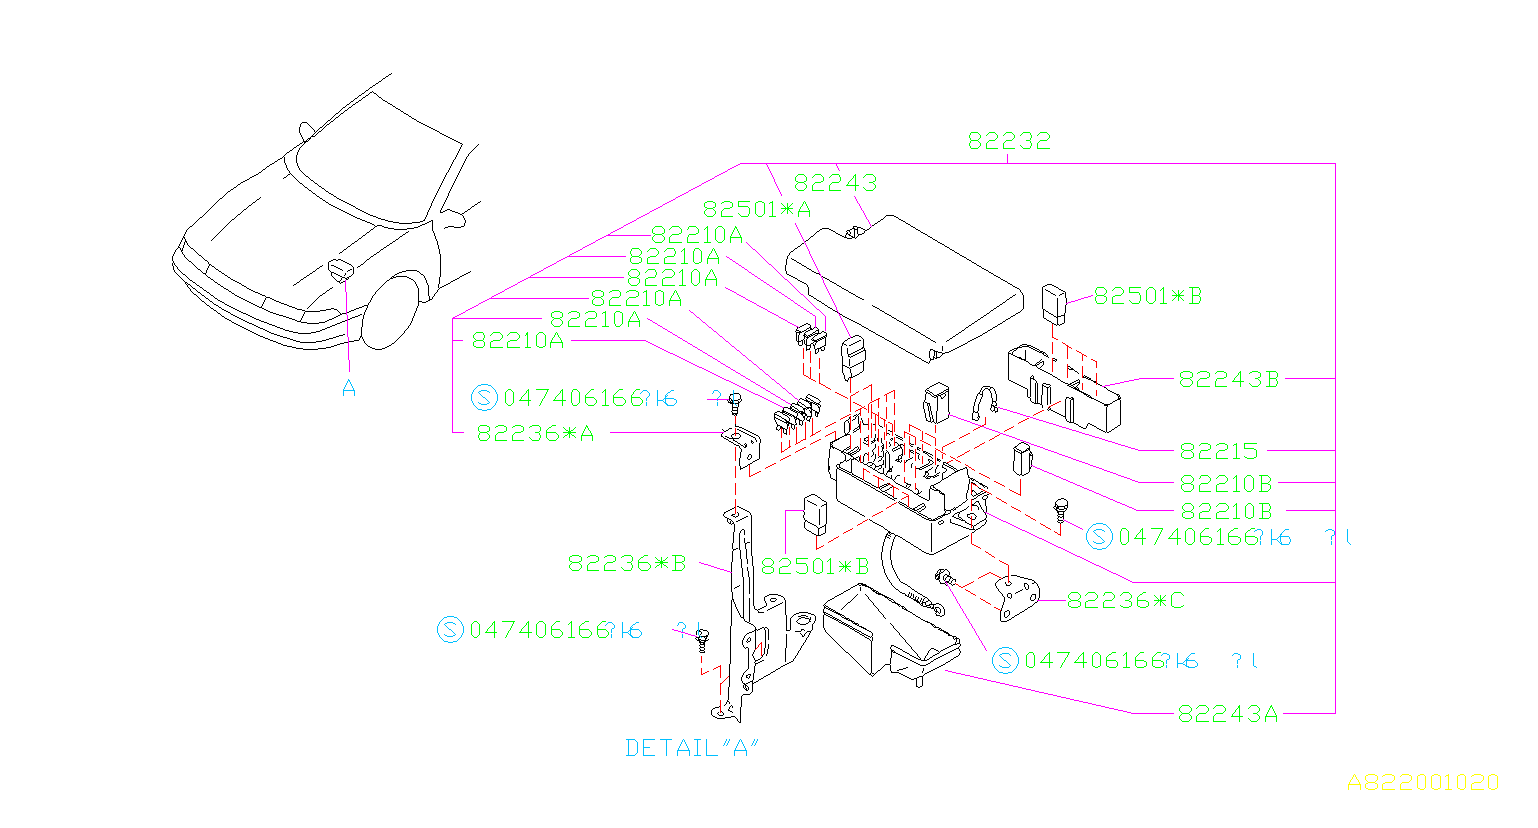 1996 Subaru Svx Fuse Box. 82233aa000 genuine subaru fuse main. clock and  climate control not working the subaru svx. subaru svx fusible link fuse box  main electrical. subaru svx fuse main box2002-acura-tl-radio.info